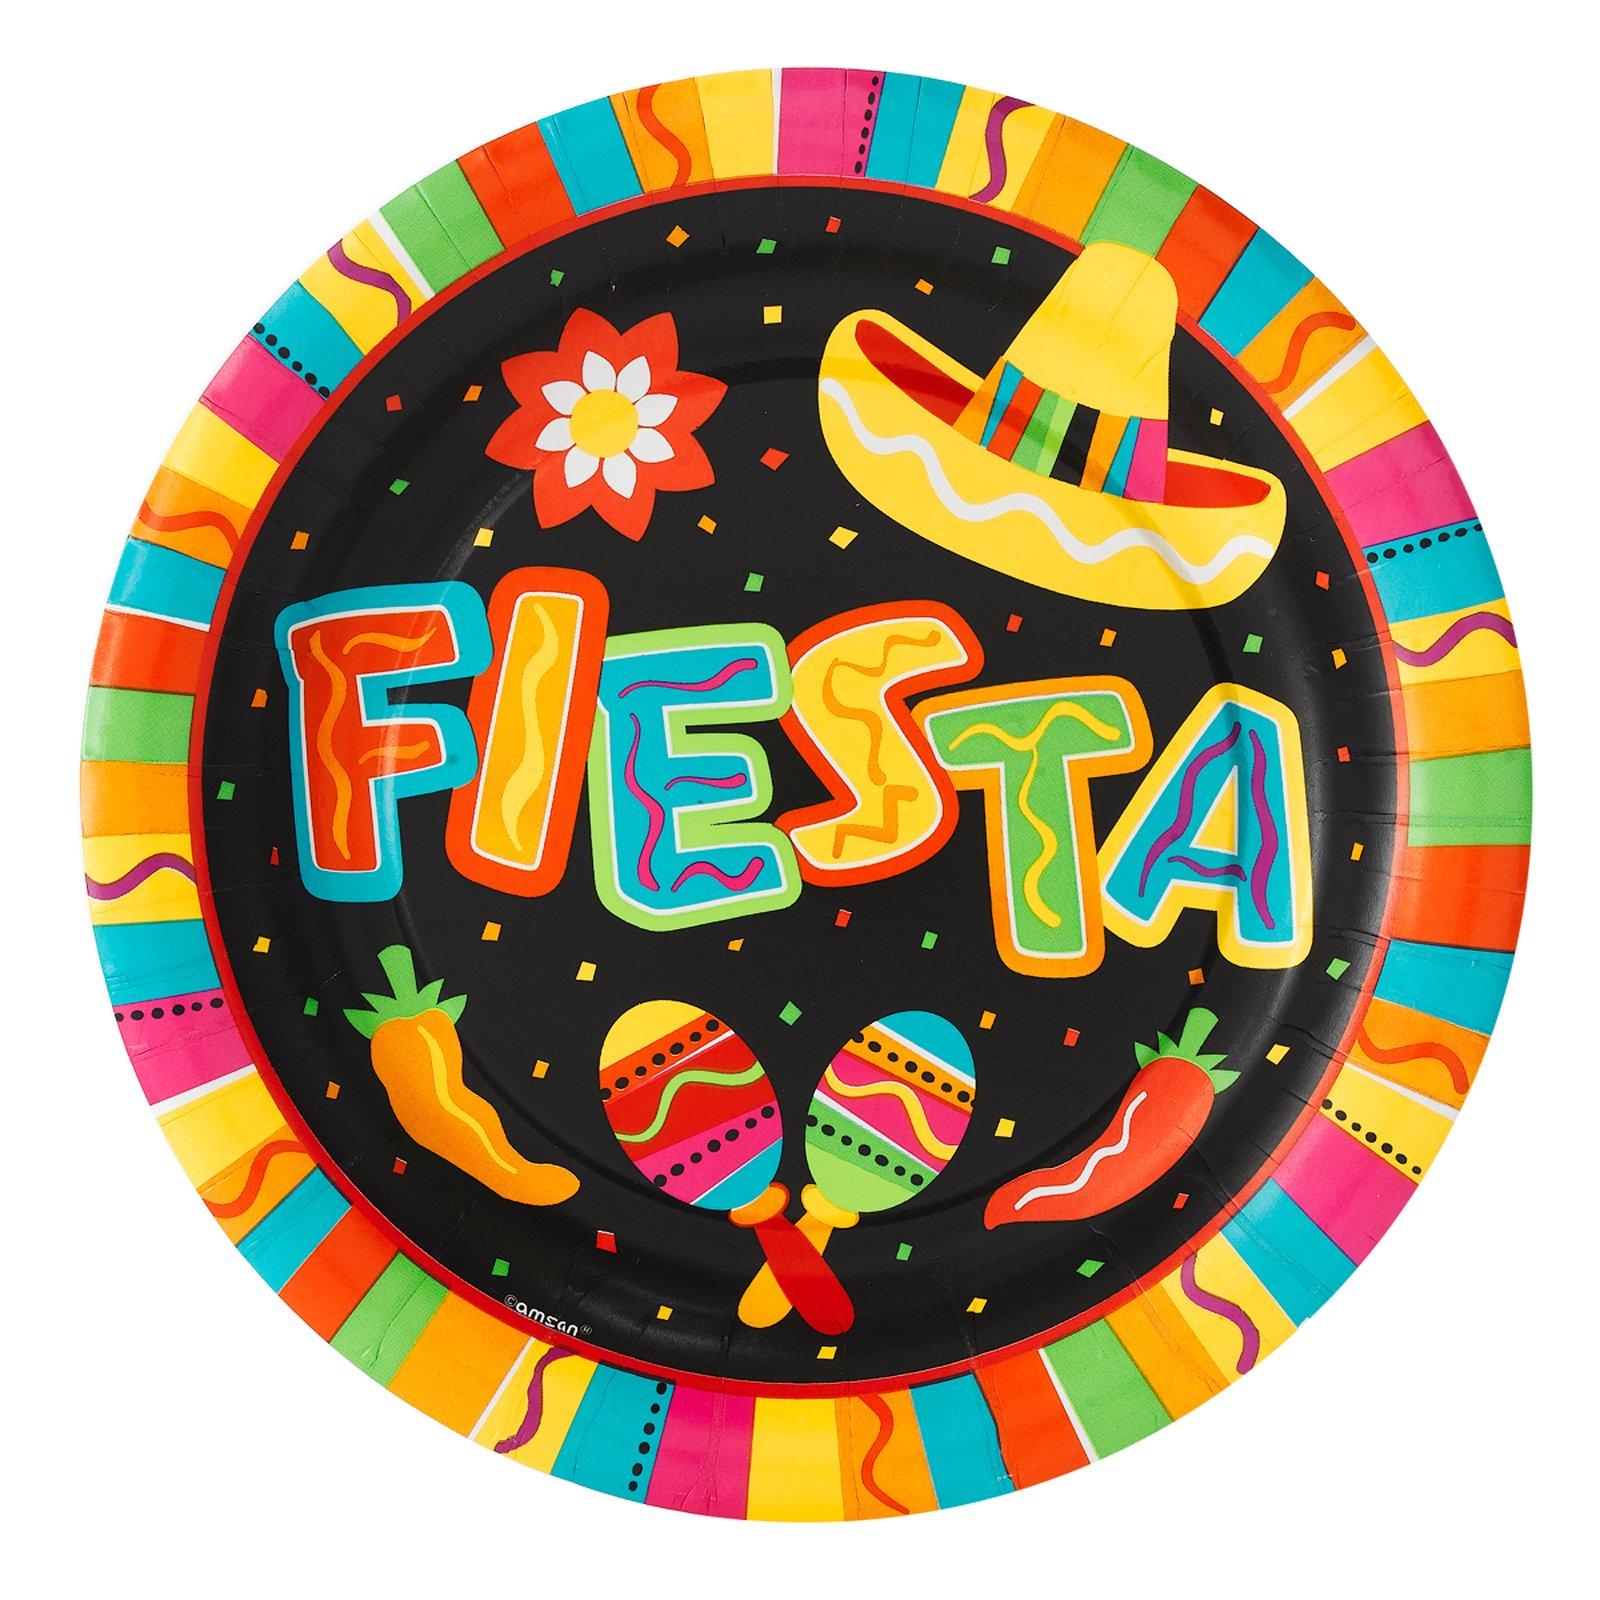 Fiesta Quette Crowd Etiquette For Outdoor Events